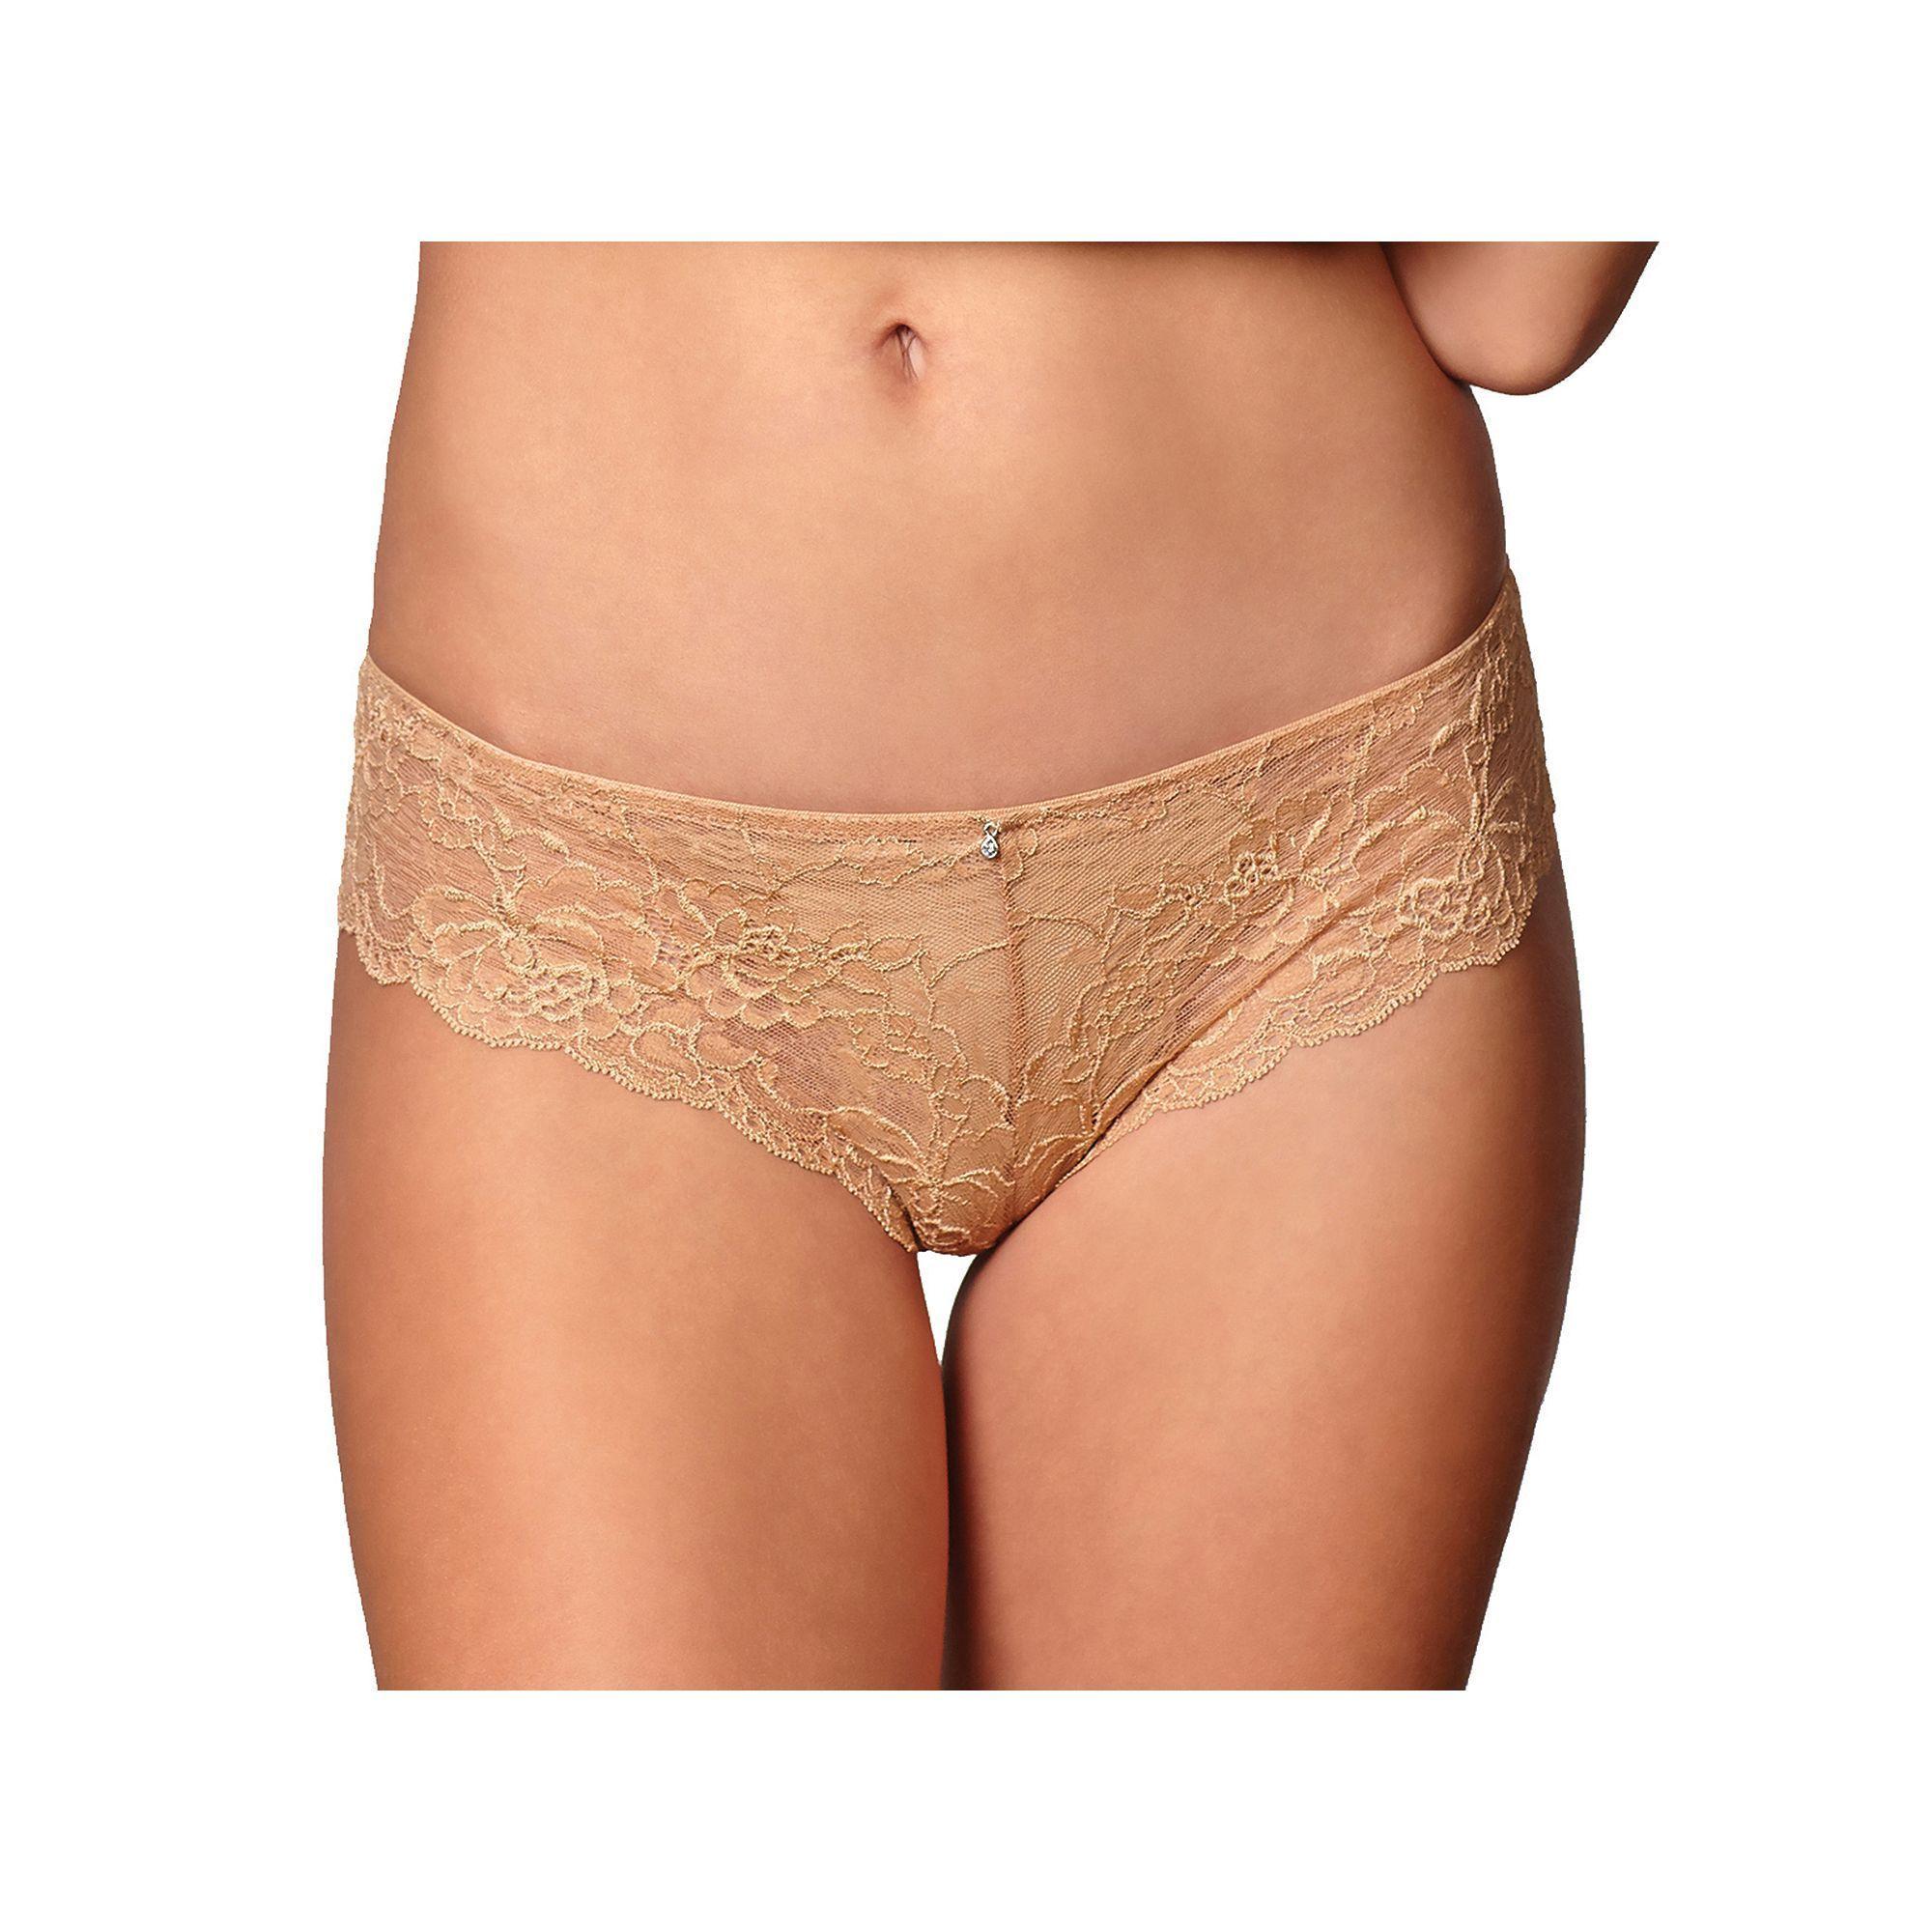 Montelle Intimates Brazilian Lace Cheeky Hipster Panty , Women's, Size: XS,  Black